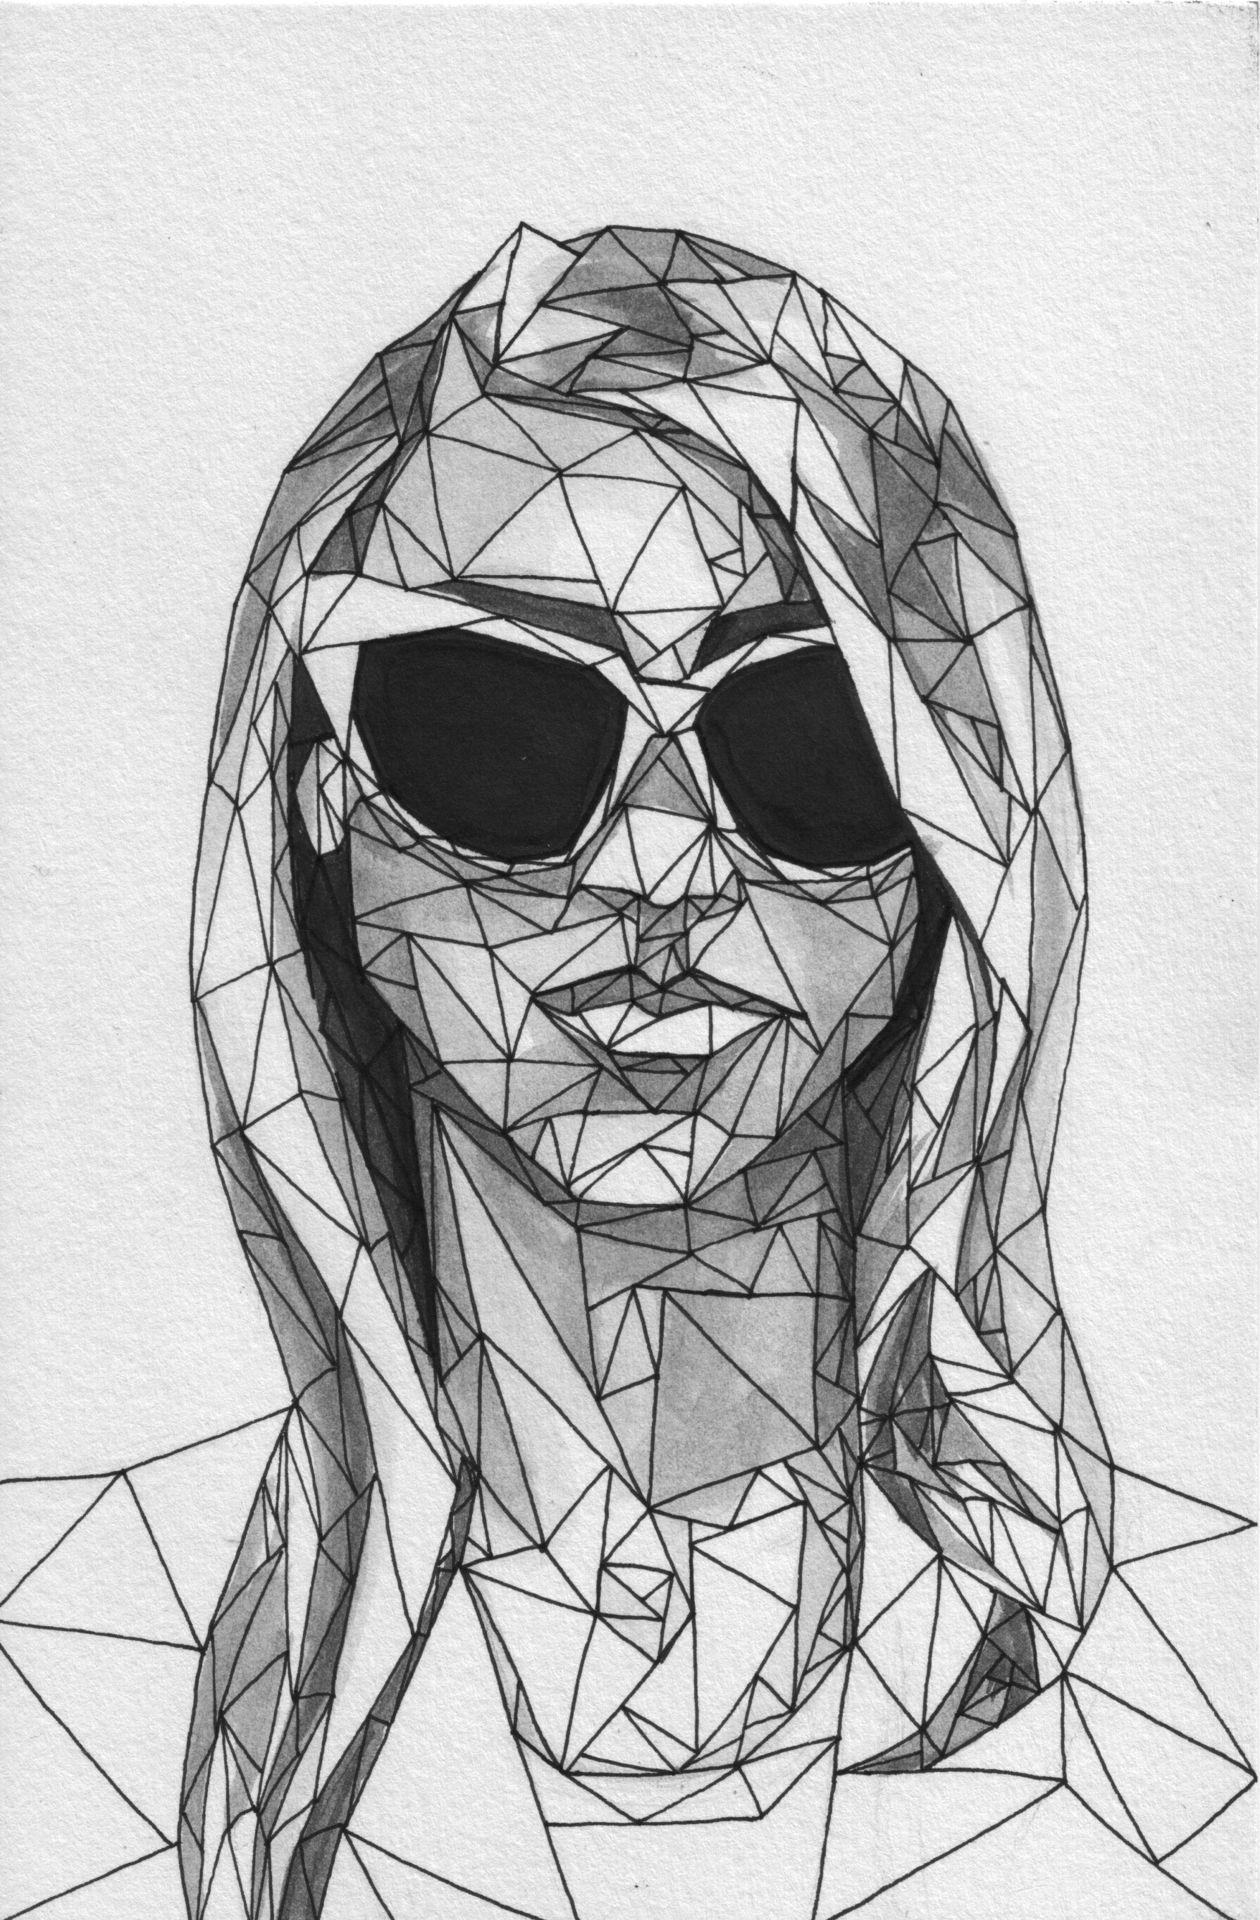 Geometric Line Drawing Artists : Tumblr m iy ztagm qe ayo g arte